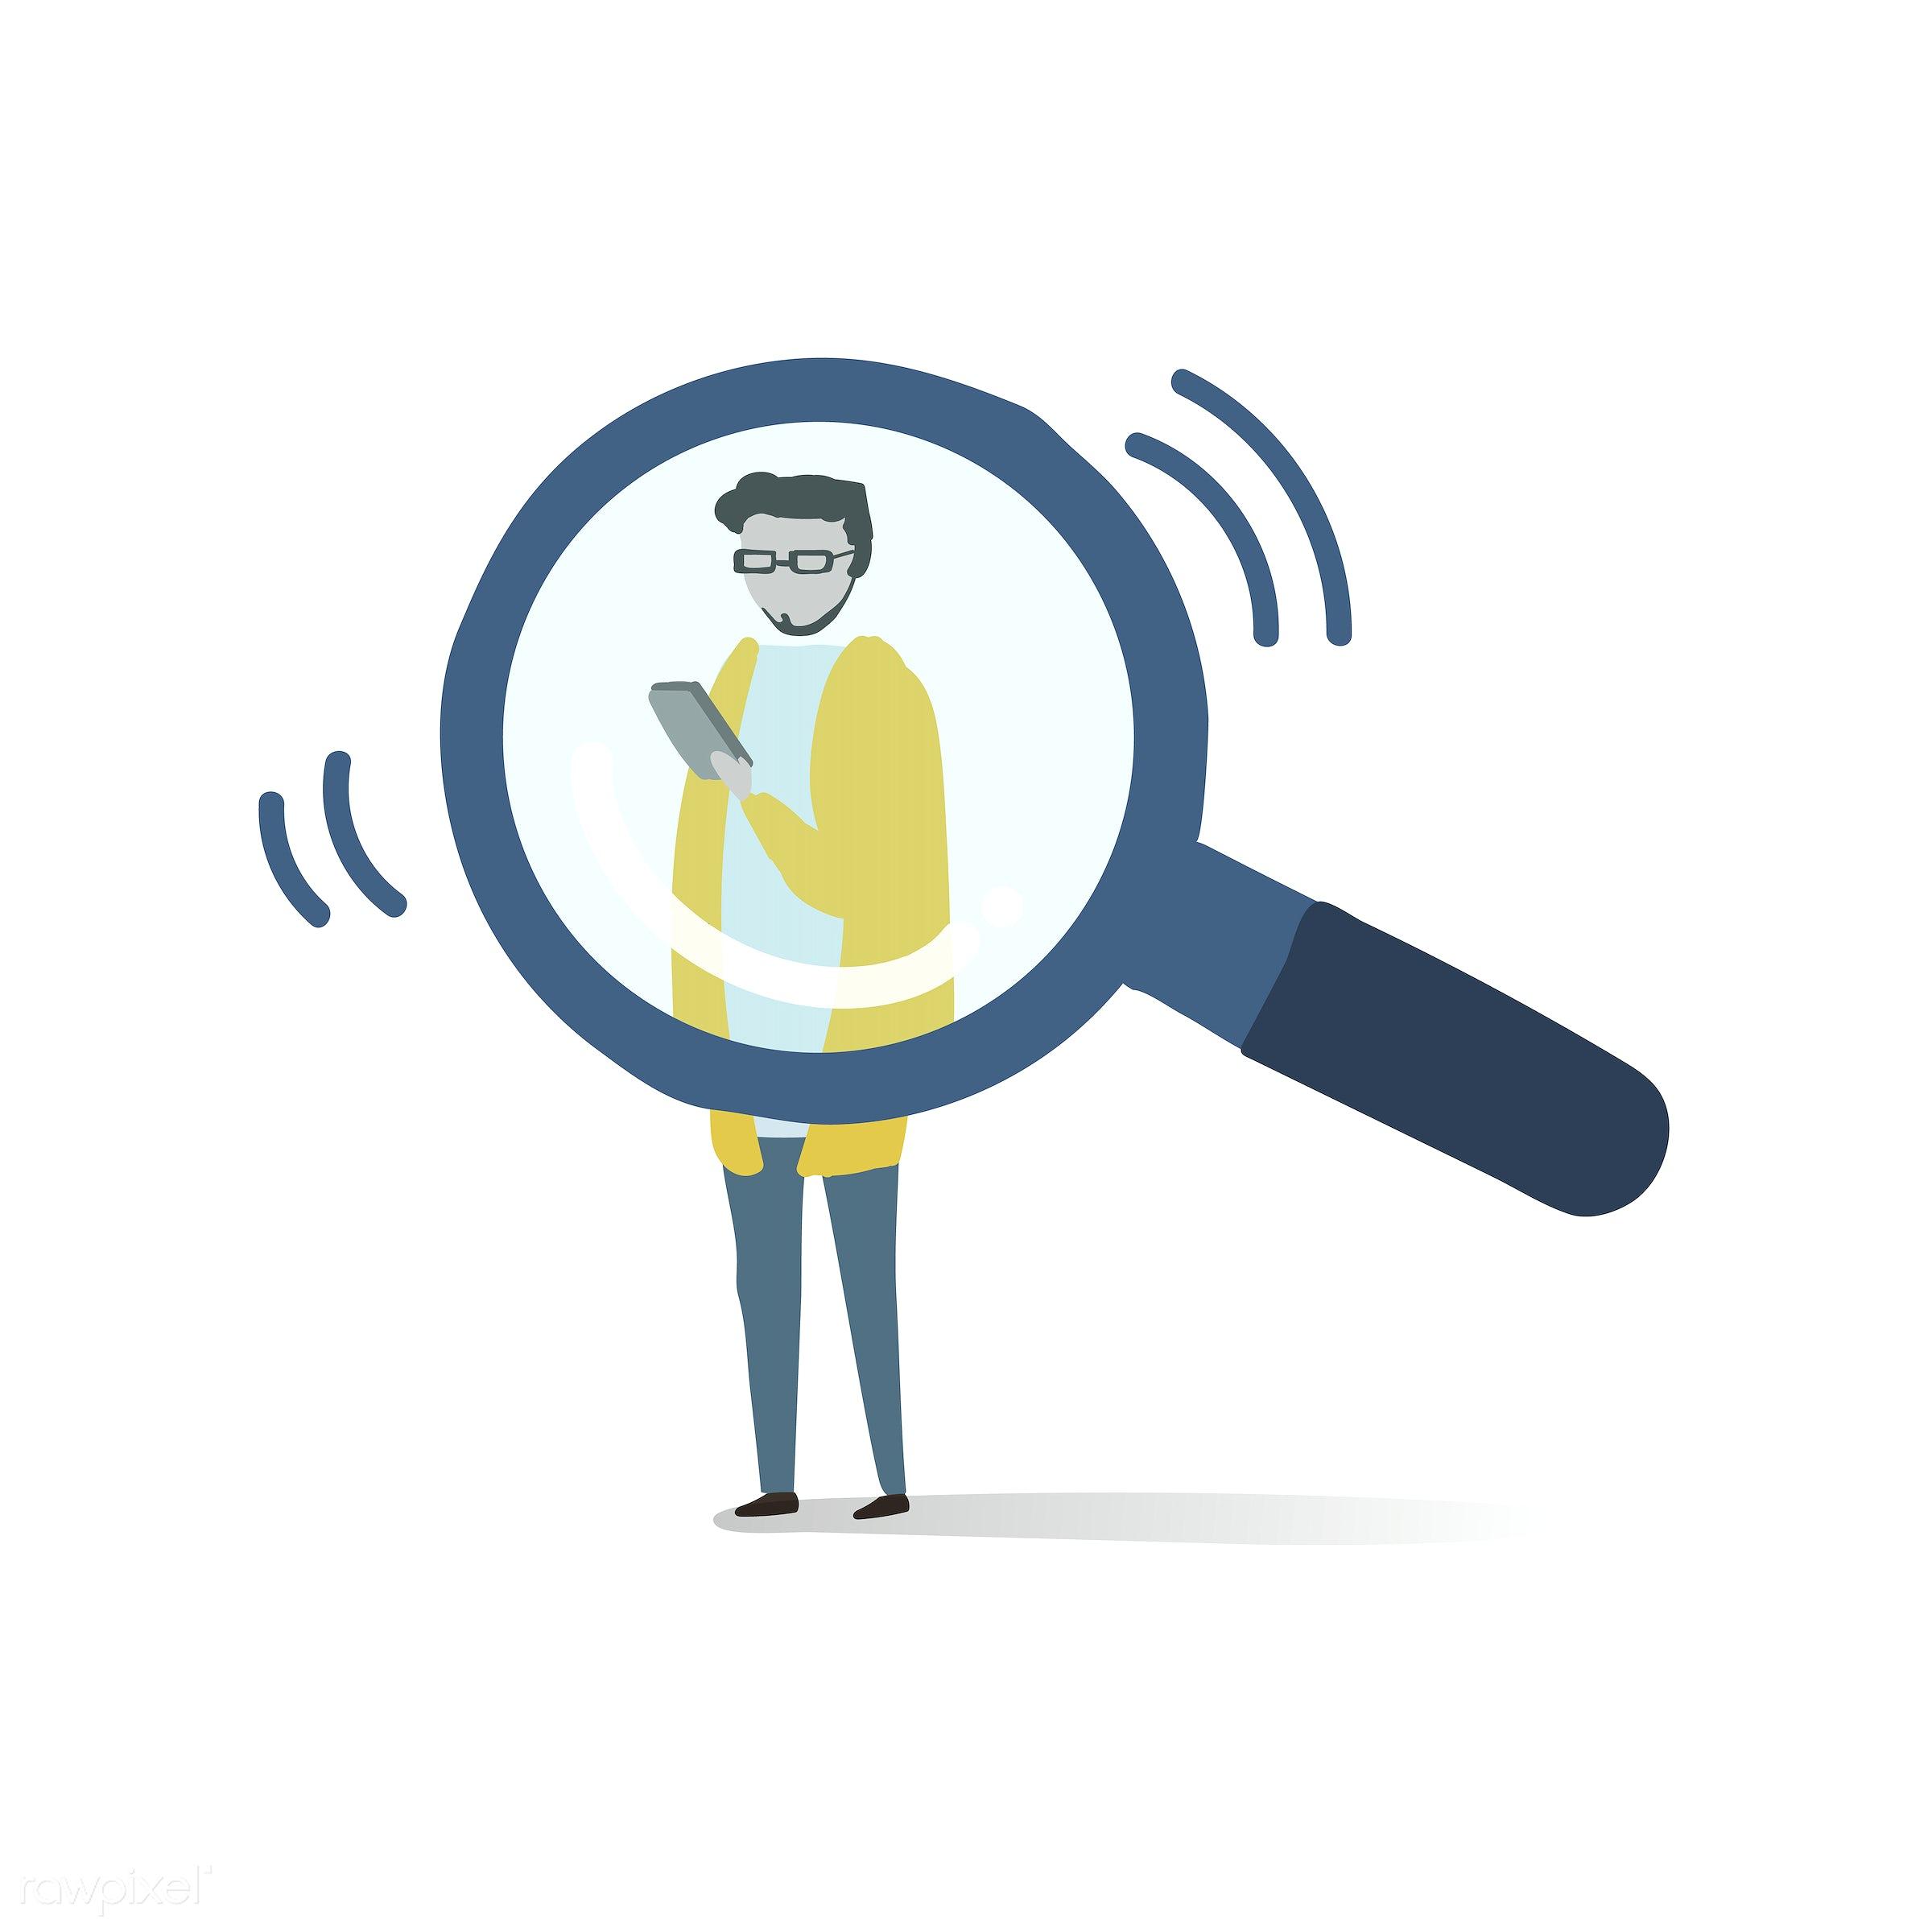 Illustration of human avatar using technology - collection, graphic, icon, illustration, set, vector, activity, avatar,...